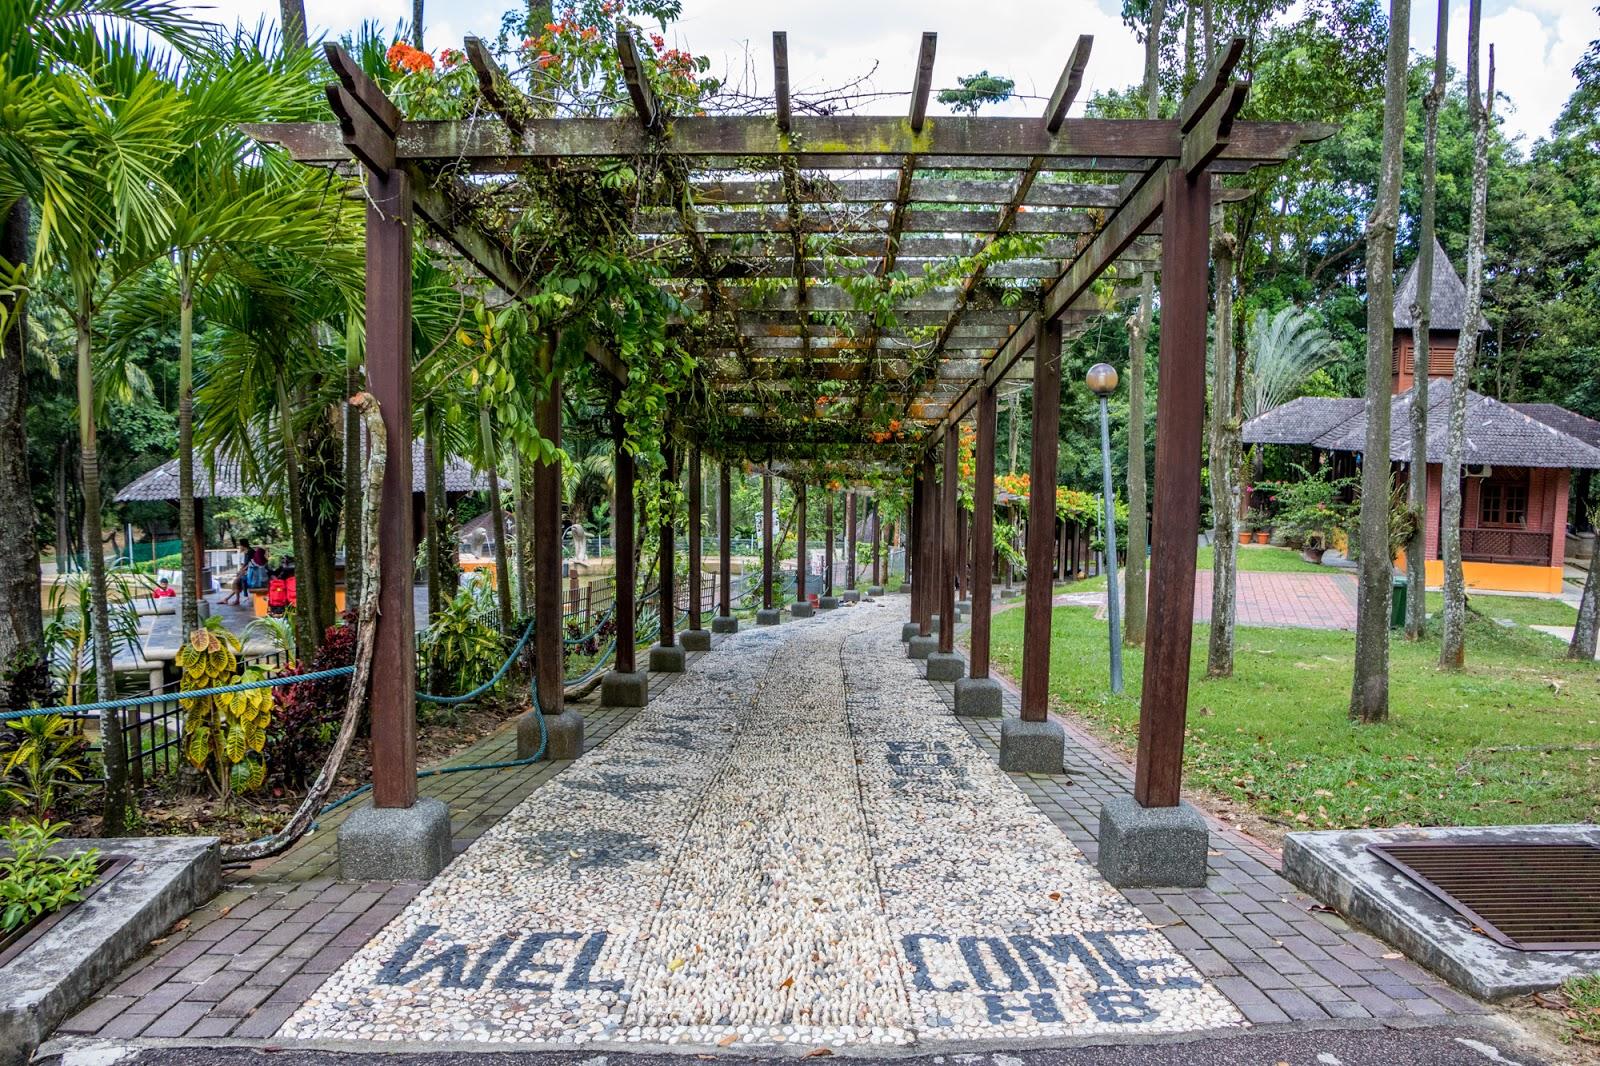 Gambar Benjamin Koe Hutan Bandar Recreational Park Johor -9368